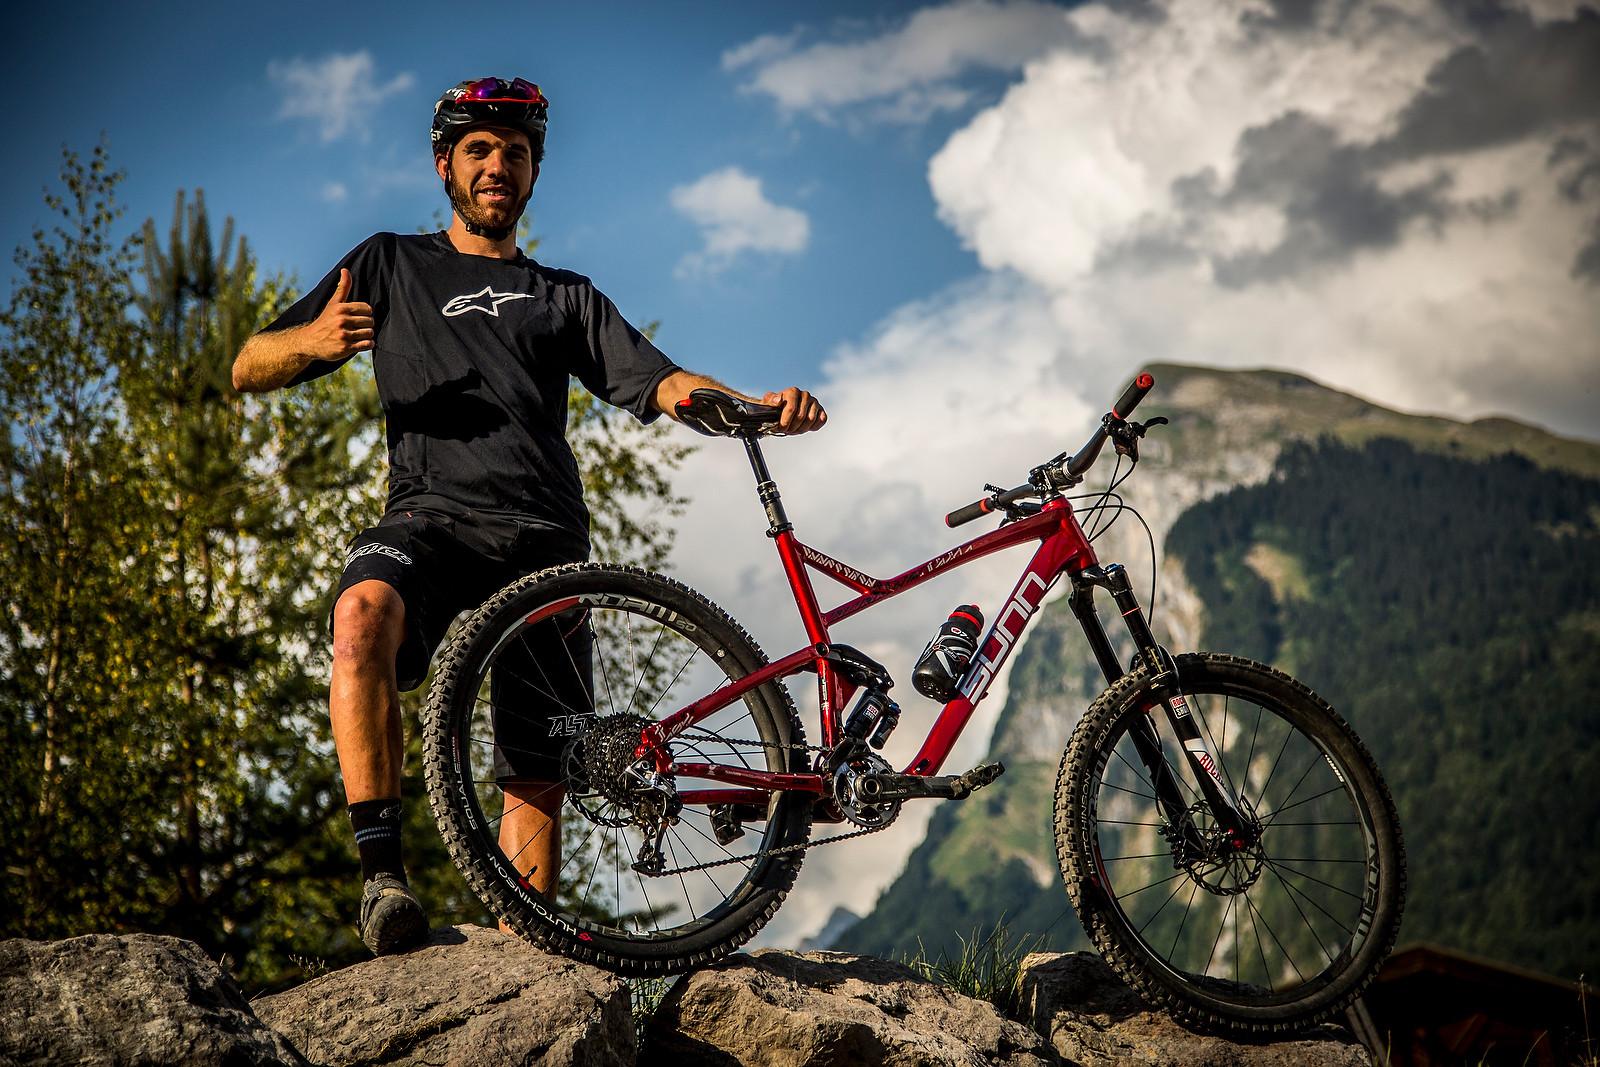 Thomas Lapeyrie's Sunn Kern LT Enduro Bike  - PIT BITS - Enduro World Series, Samoens, France - Mountain Biking Pictures - Vital MTB